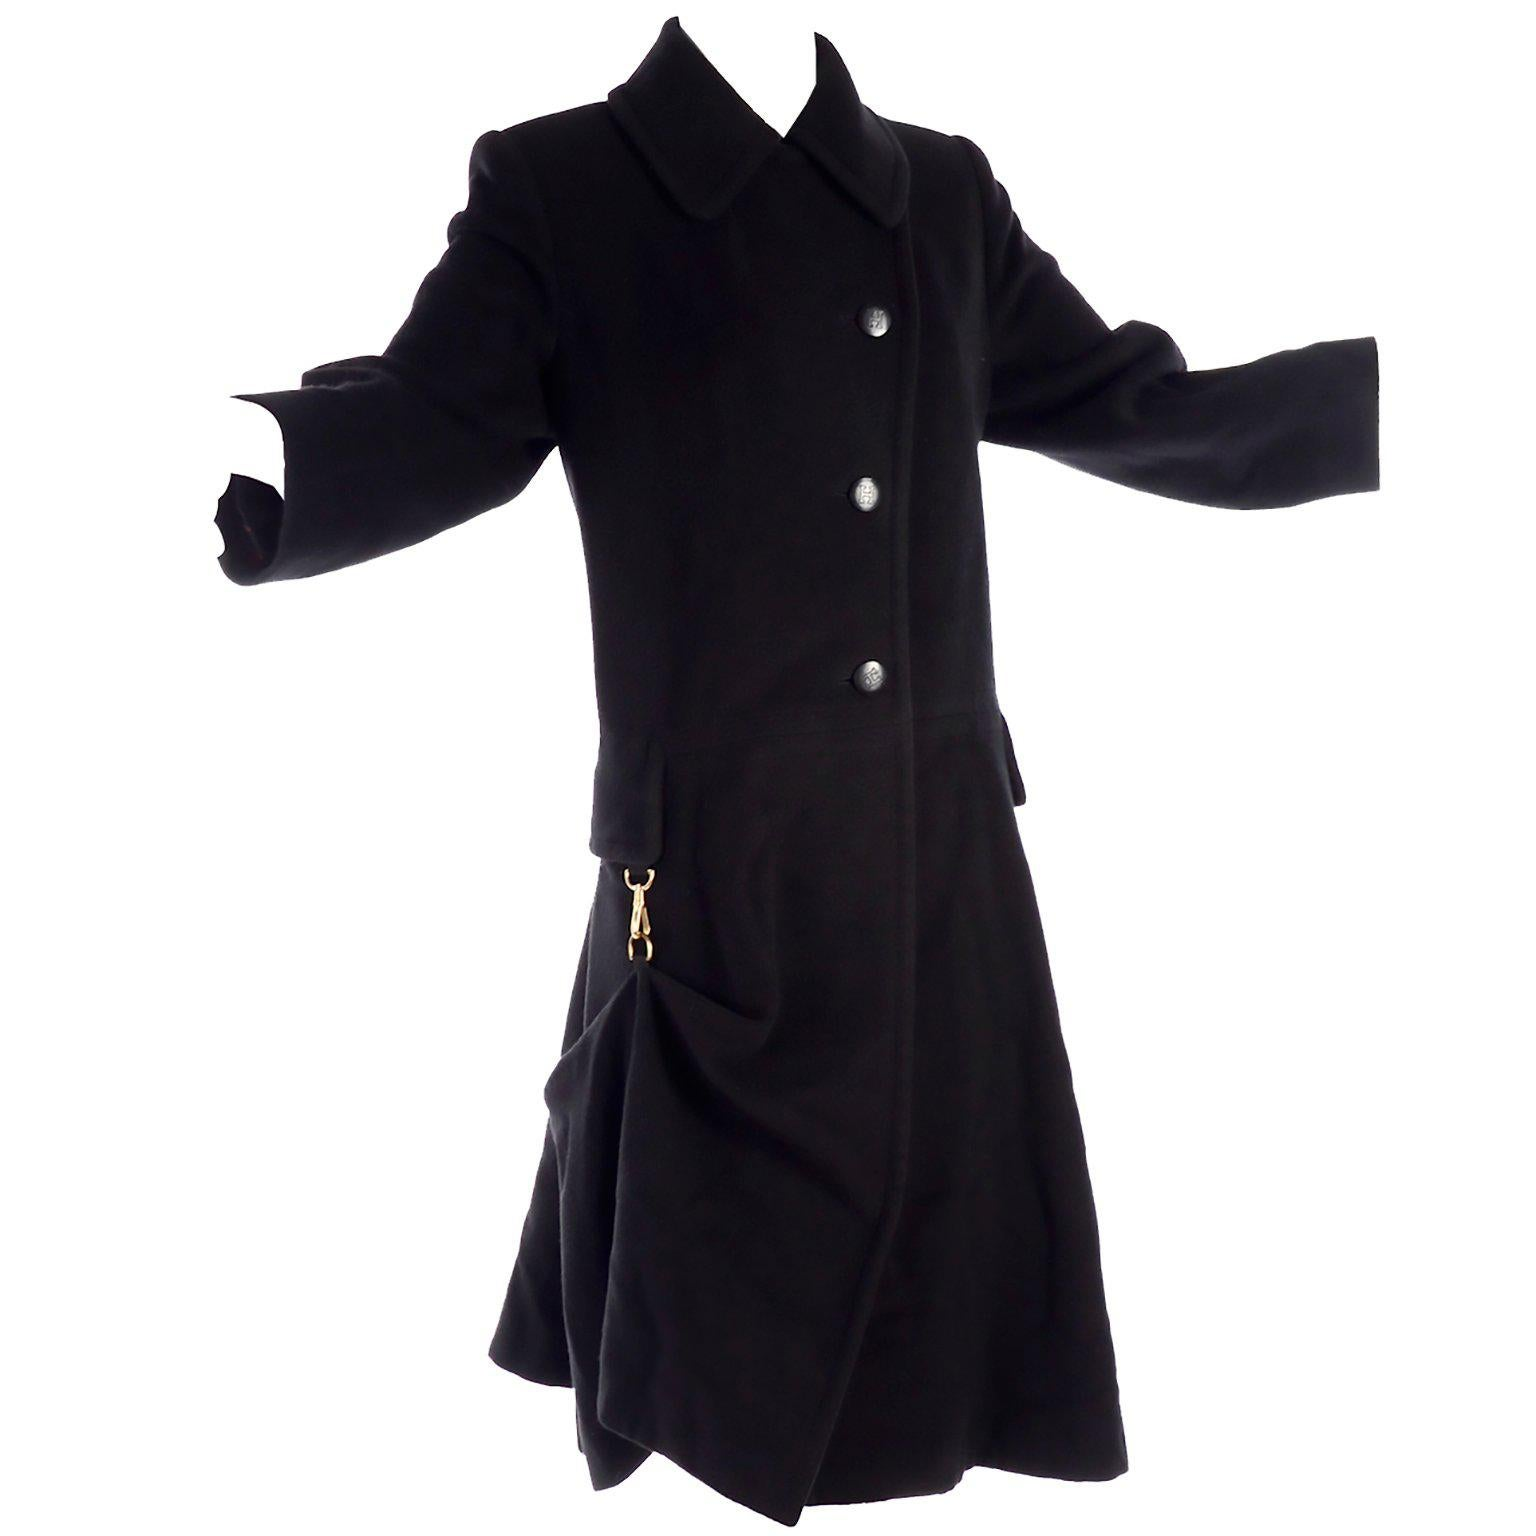 Hermes Vintage  Black Cashmere Coat With Unique Toggle Clip at Hip